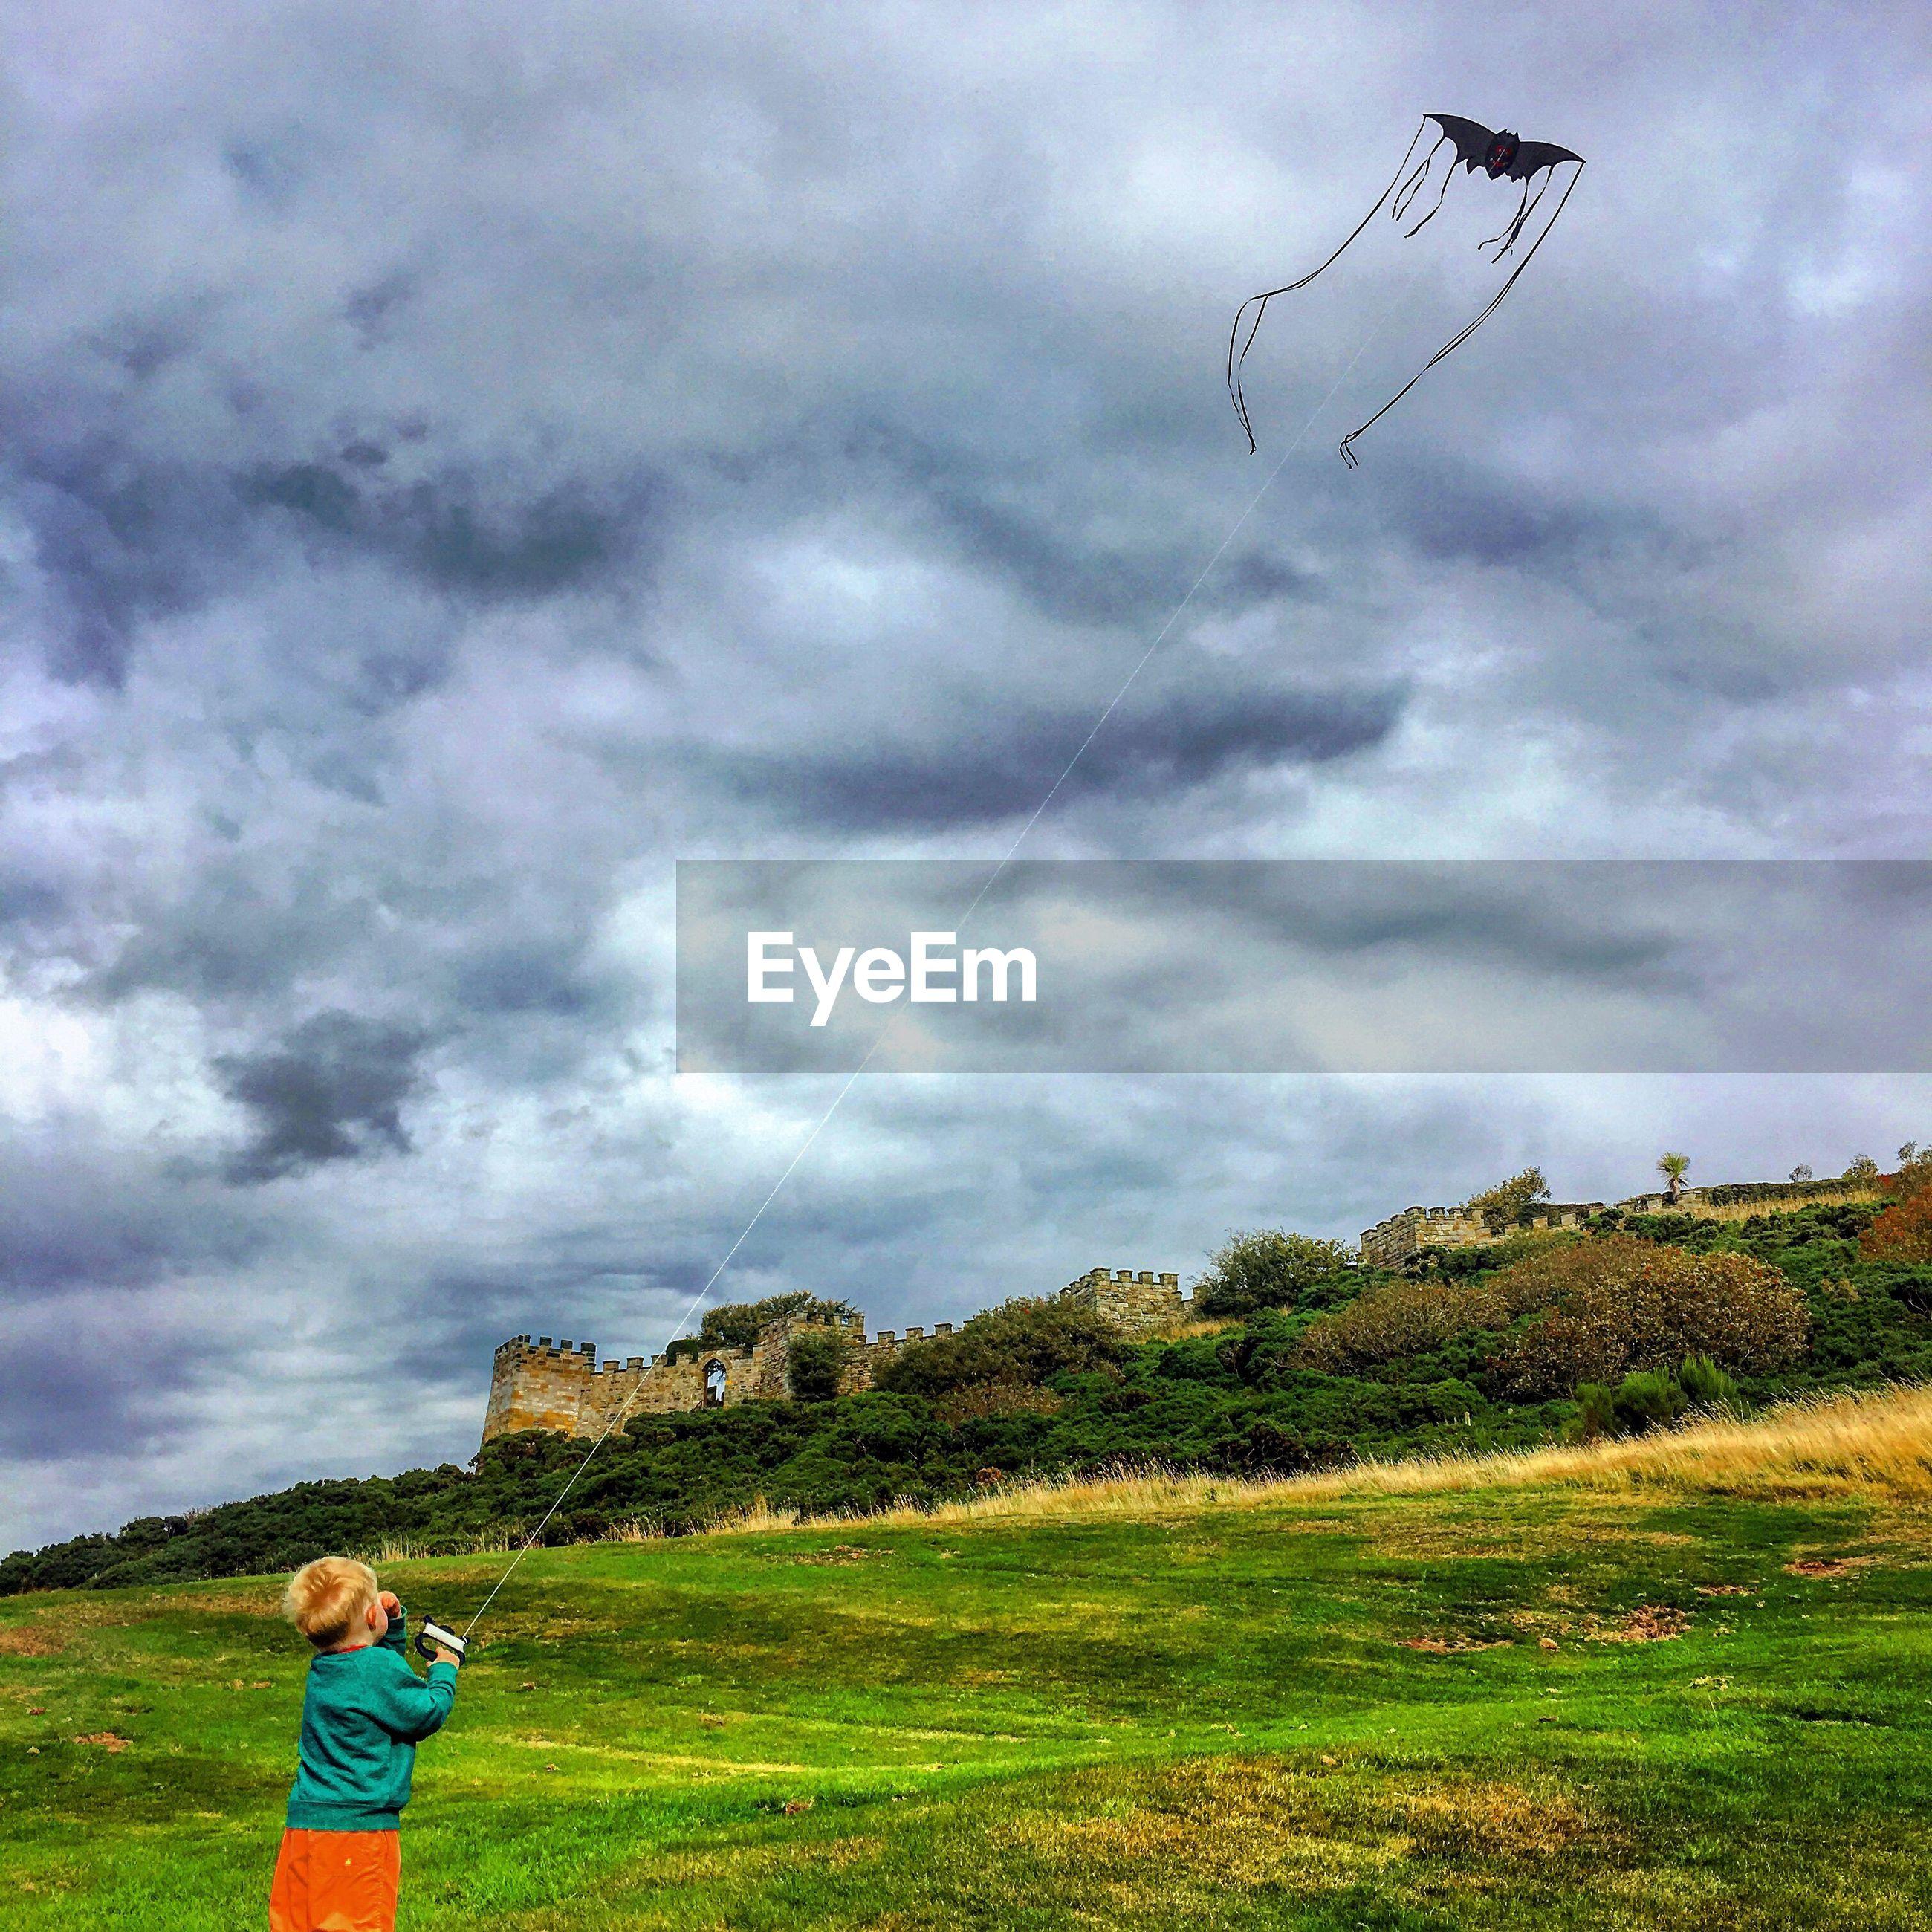 Boy flying kite on grassy field against cloudy sky